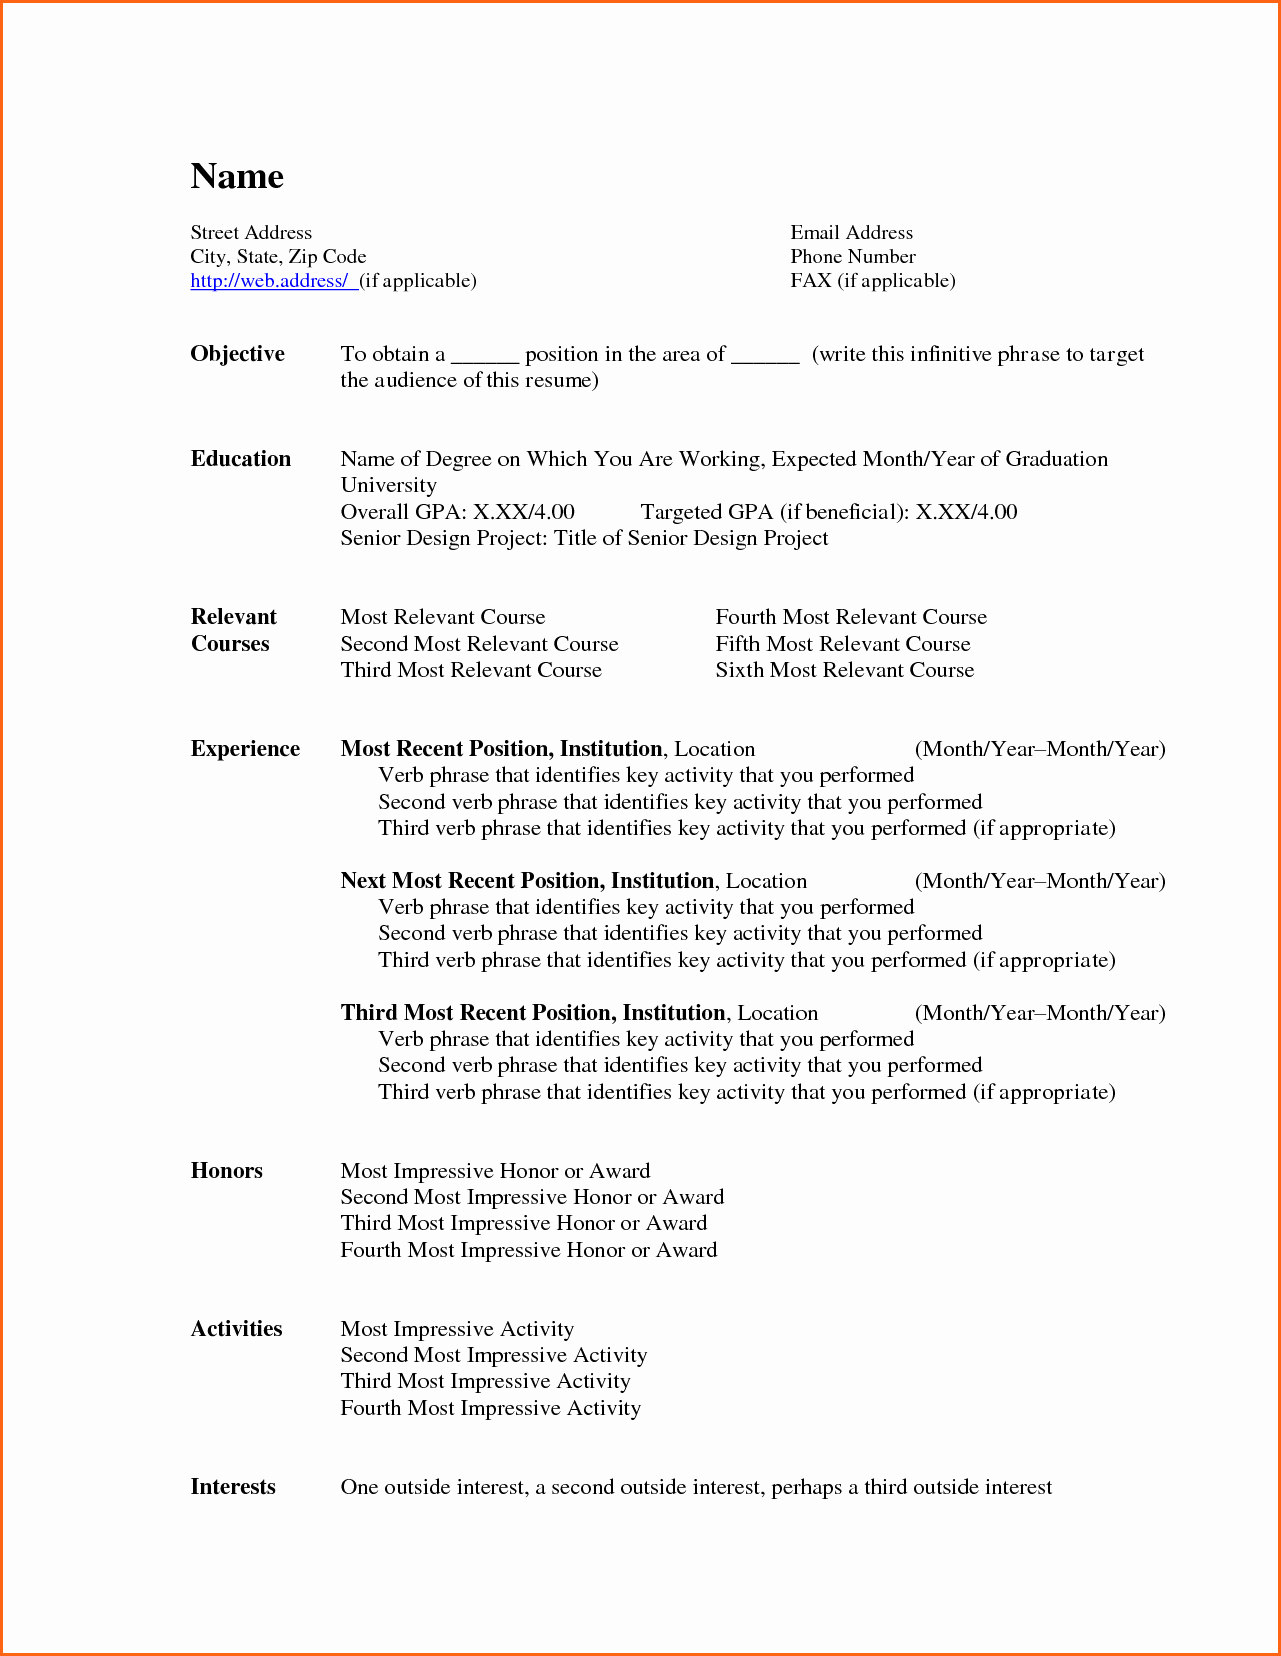 Resumes On Microsoft Word 2007 Unique 6 Free Resume Templates Microsoft Word 2007 Bud